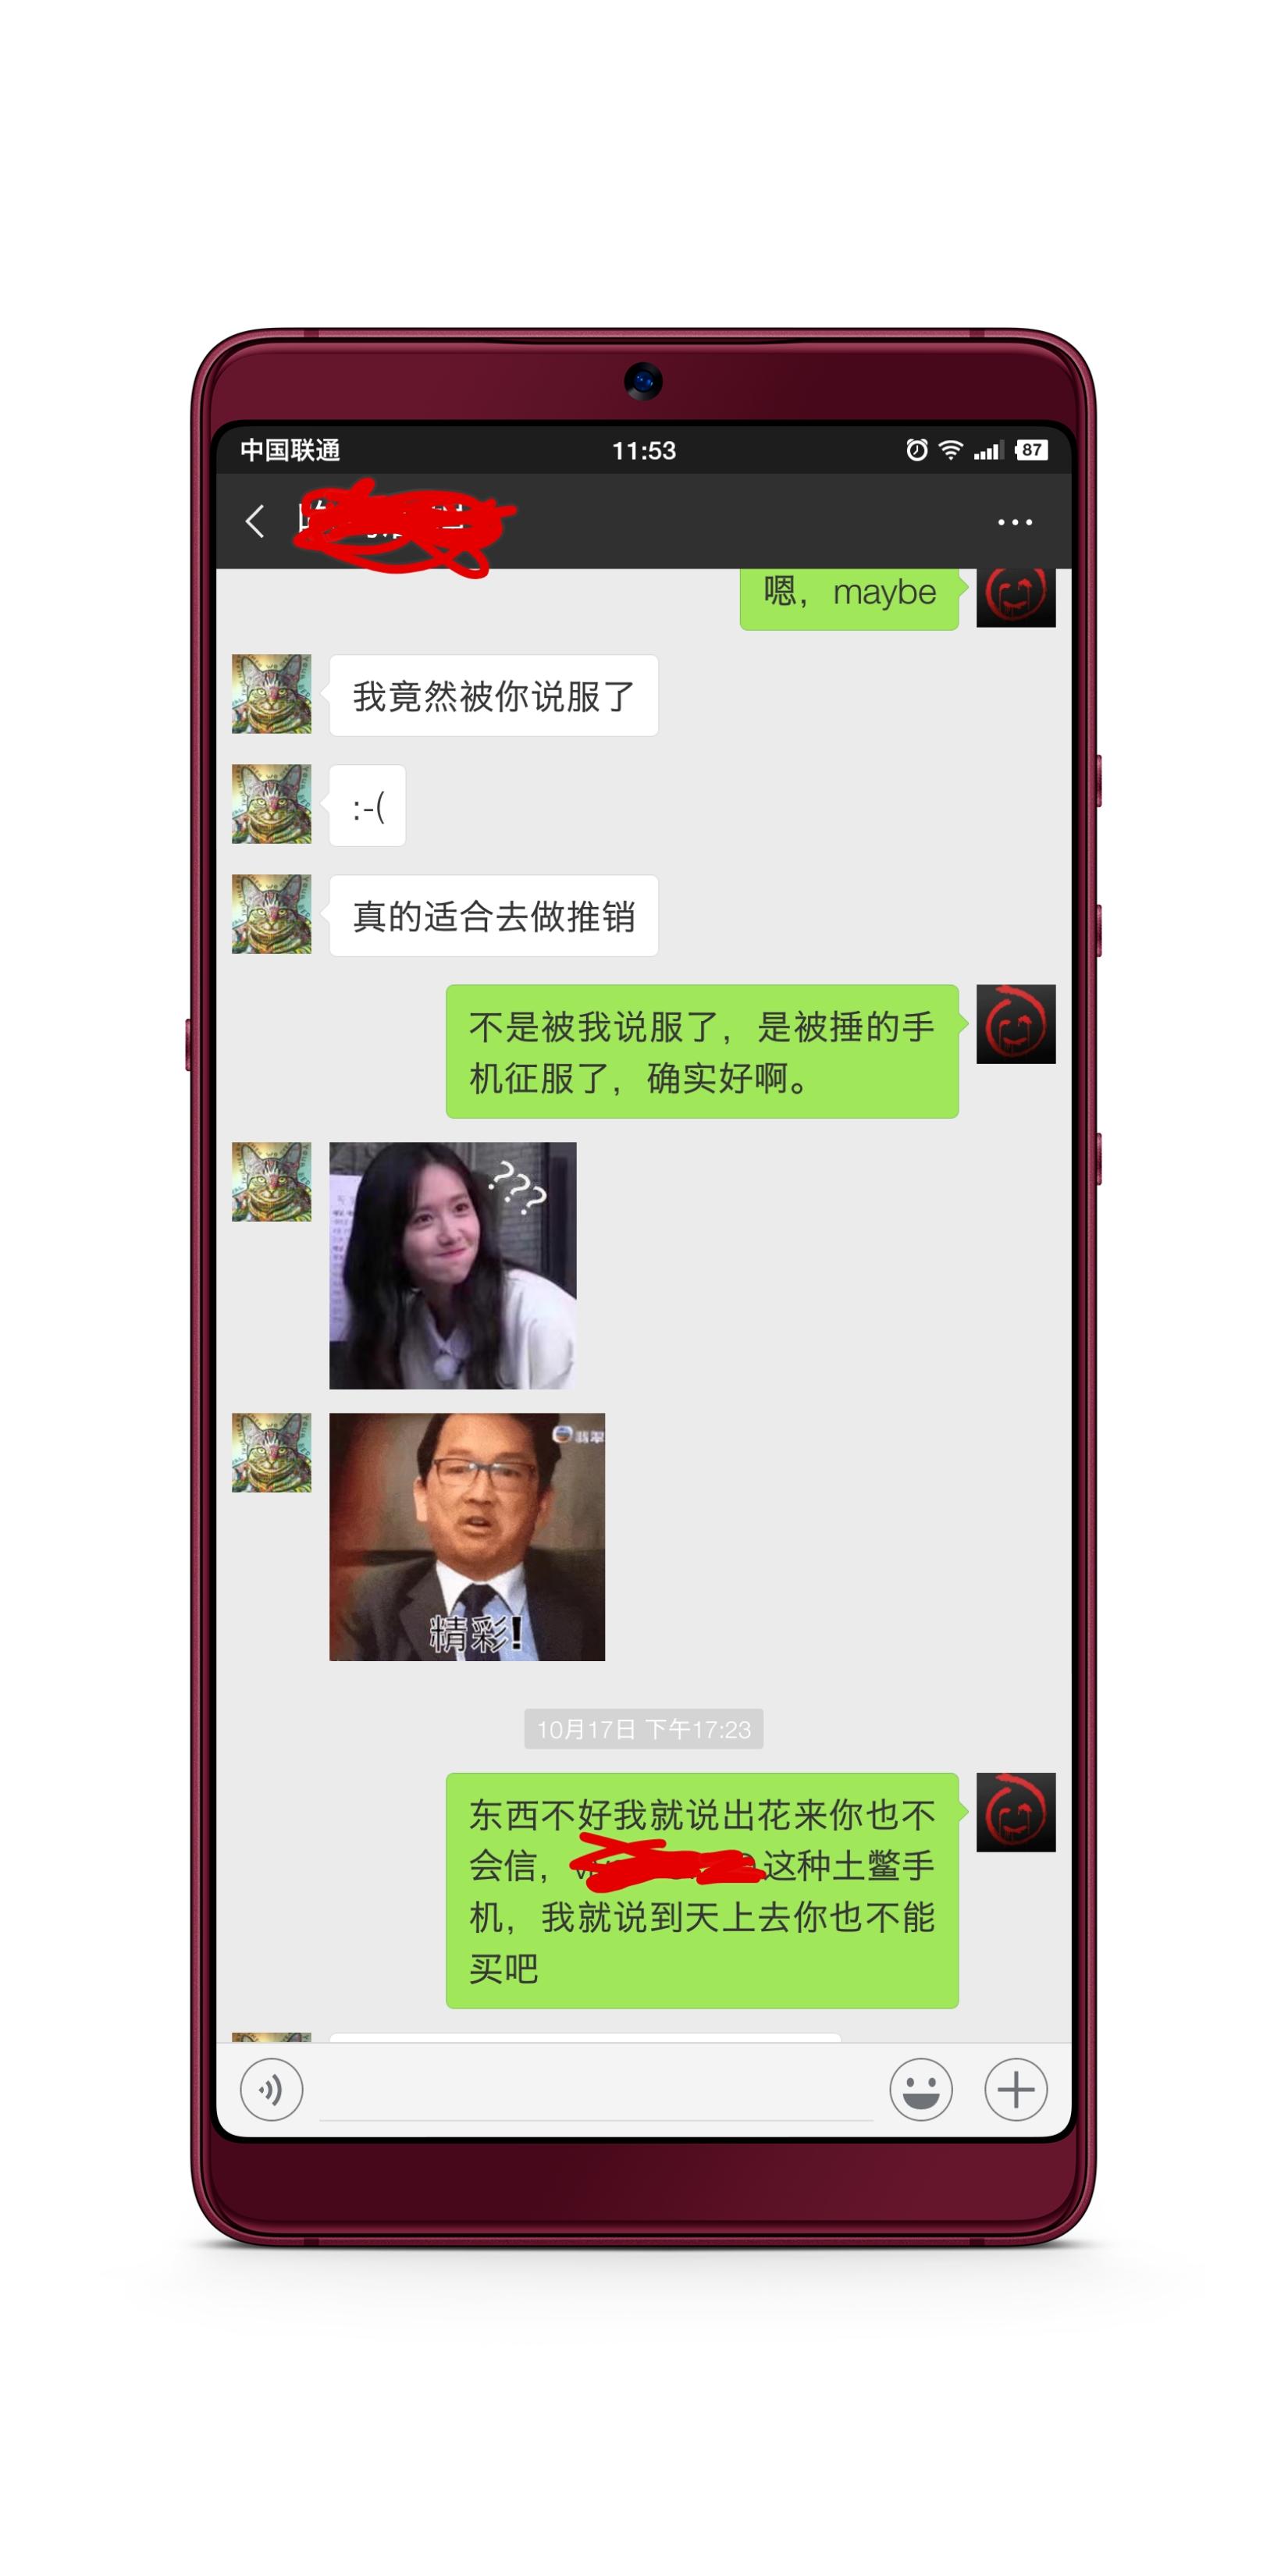 ??_Screenshot_2018-10-31-11-53-23-360_??.png